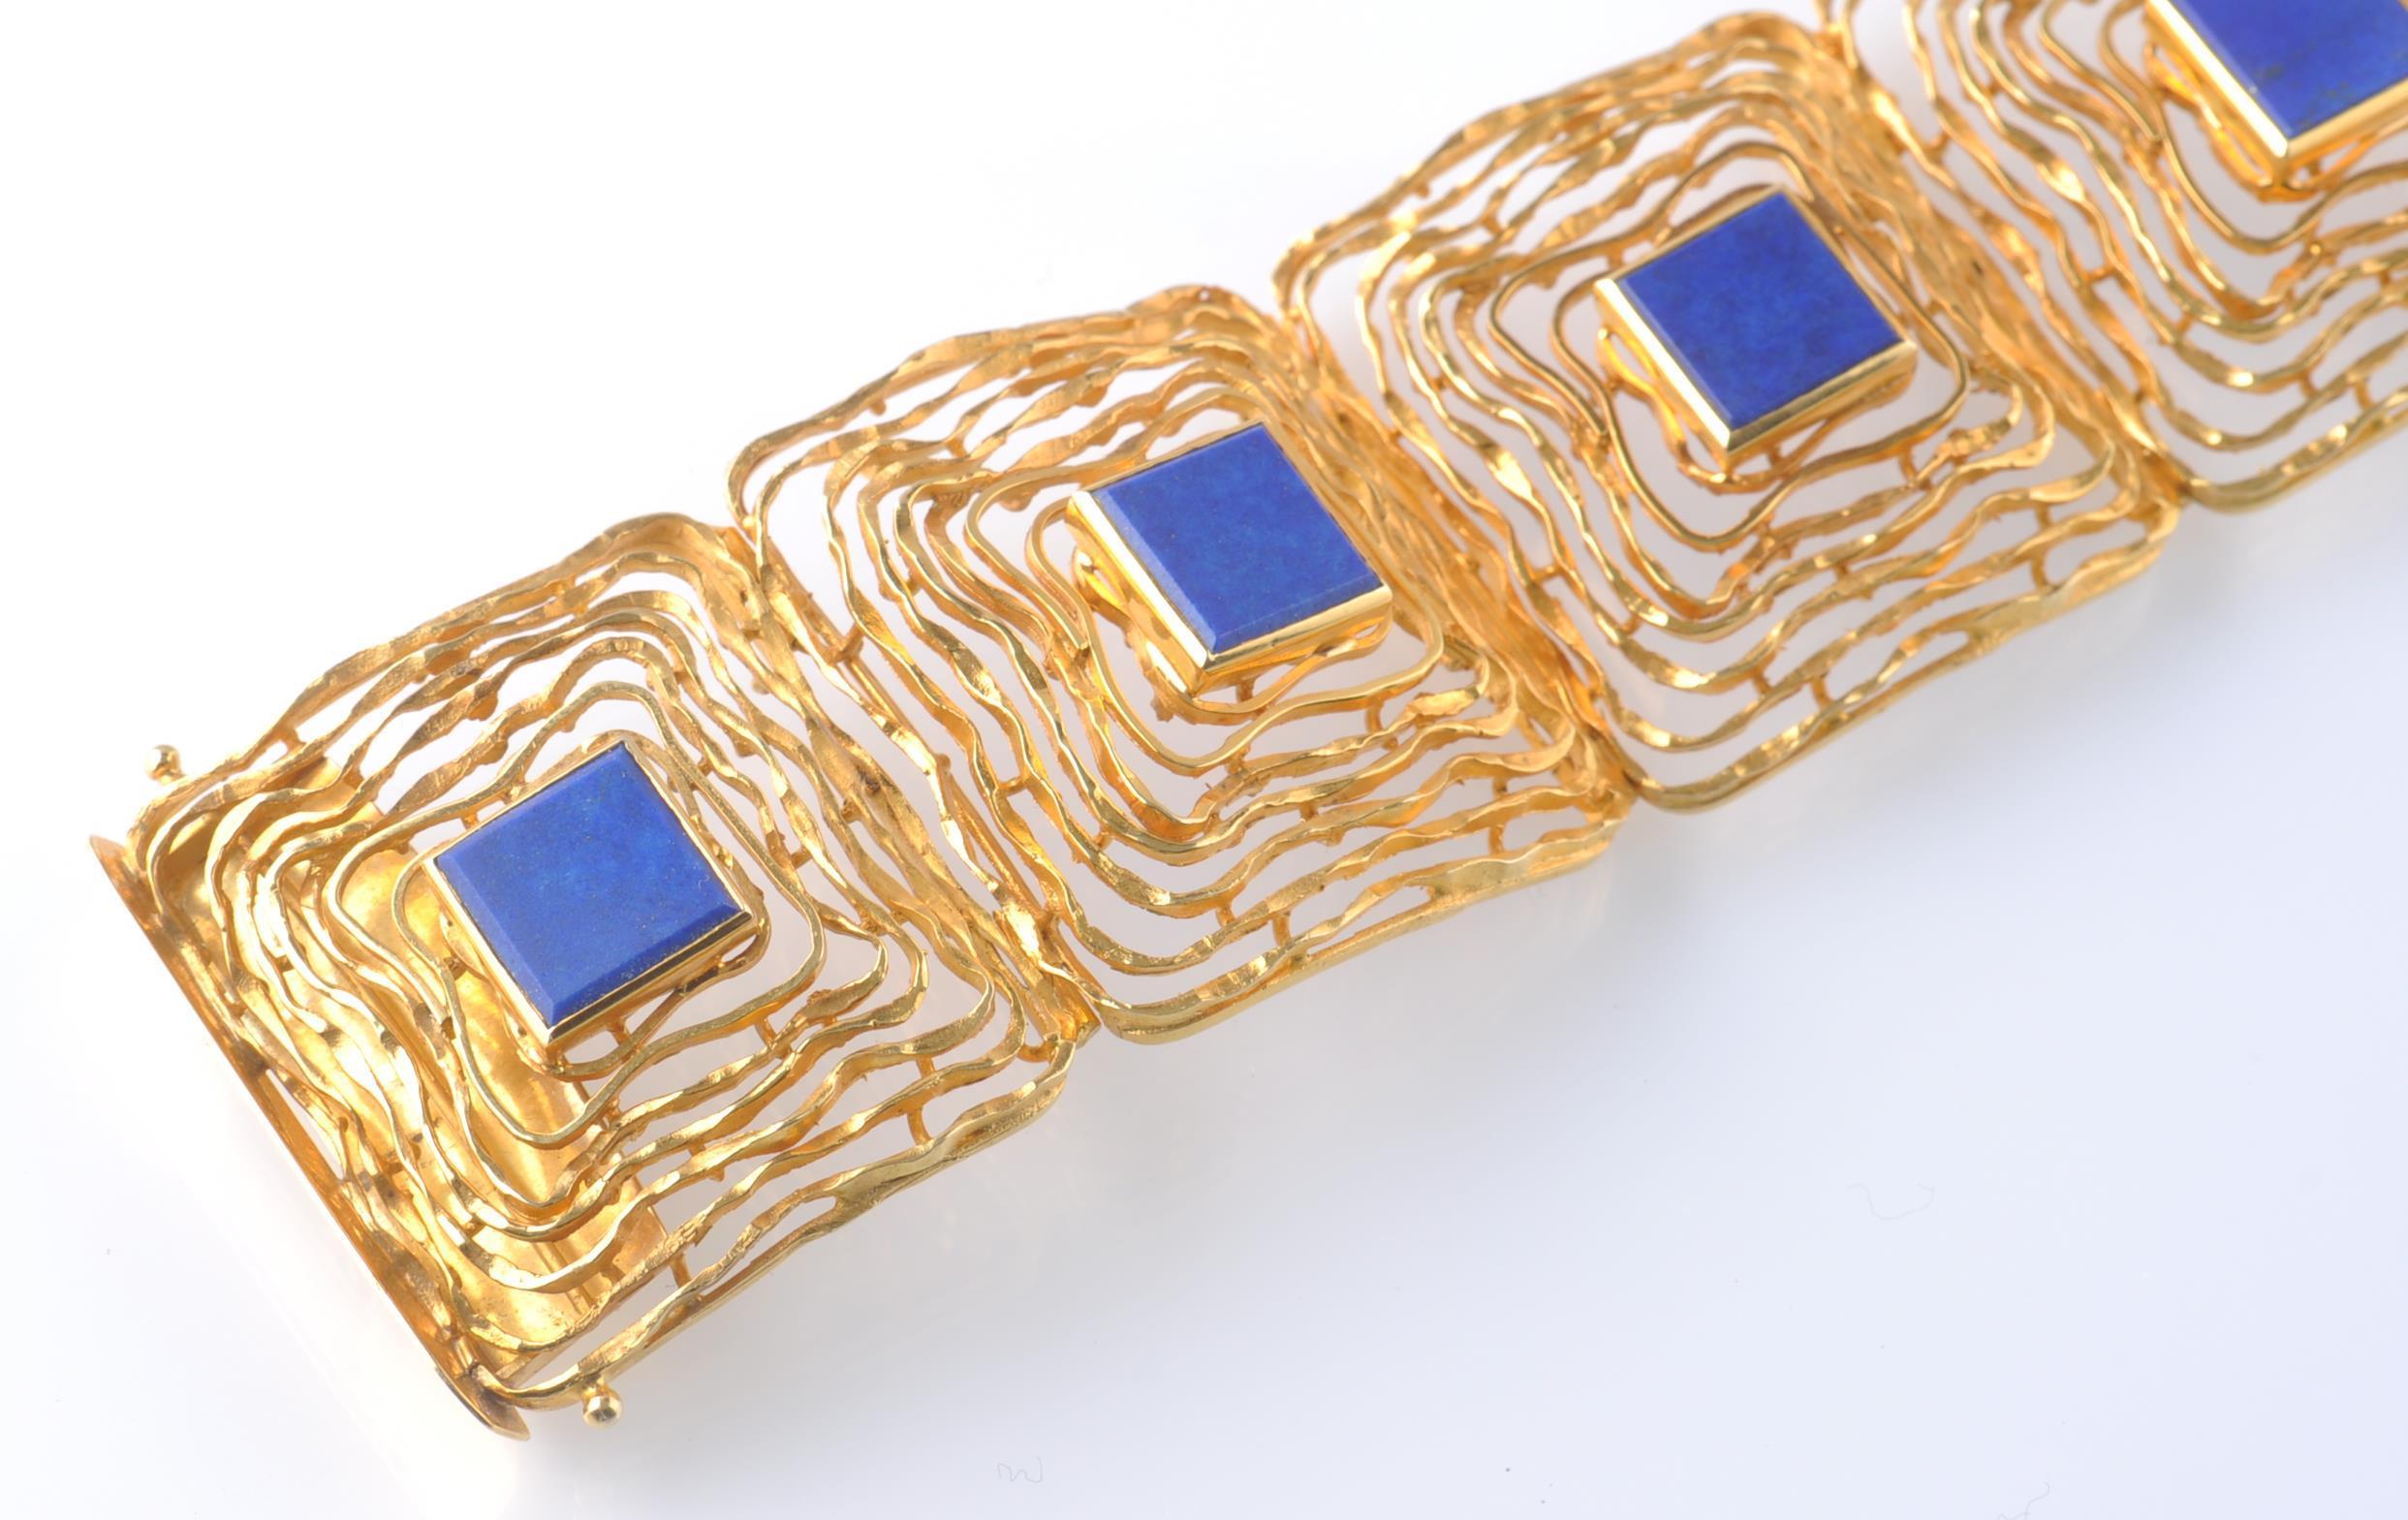 Lot 96 - A MID CENTURY 14CT GOLD AND LAPIS LAZULI BRACELET